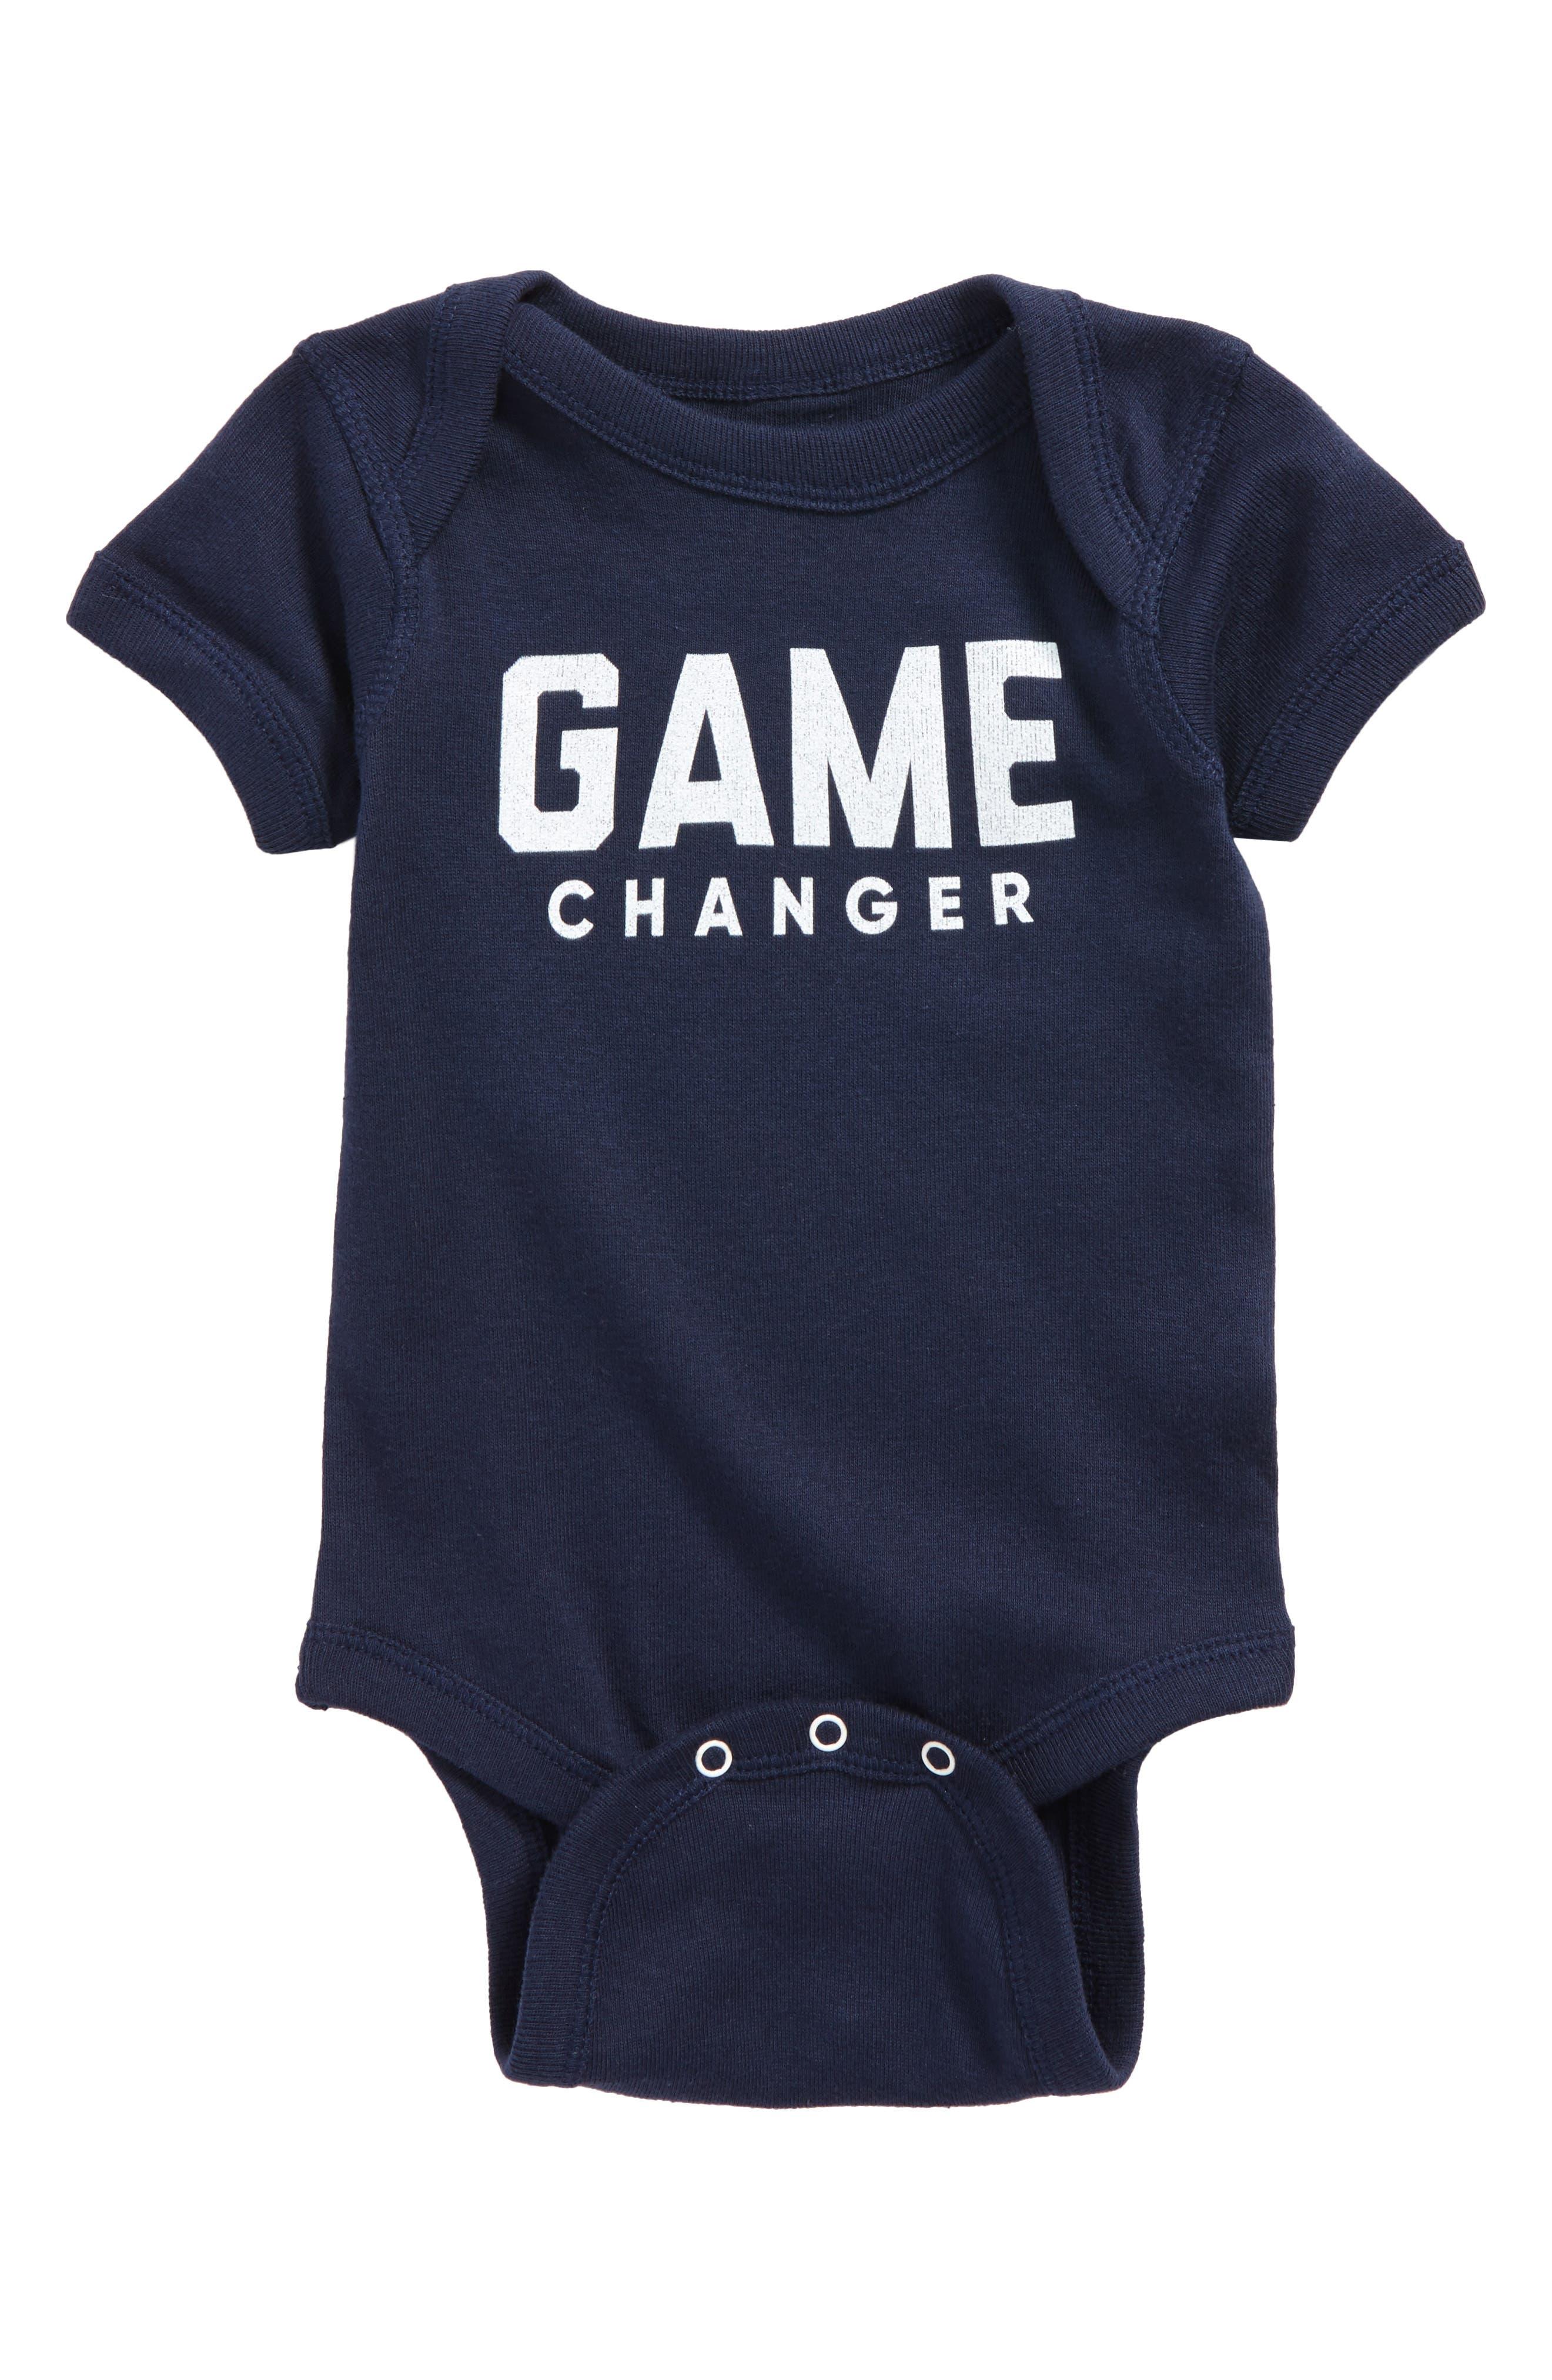 Game Changer Bodysuit,                         Main,                         color, Navy